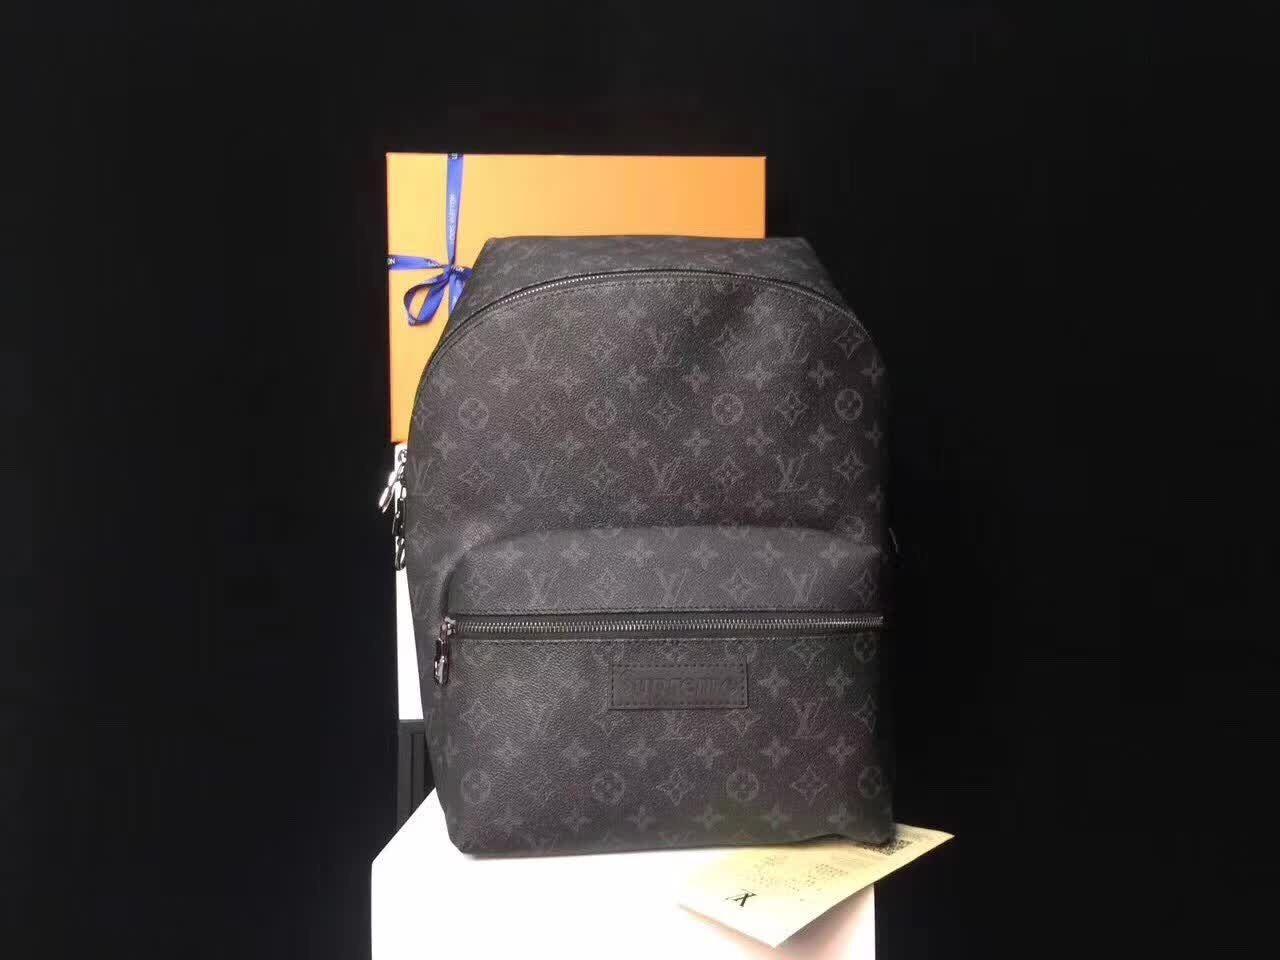 SUPREME ×ルイヴィトン シュプリーム LOUIS VUITTON コラボ モノグラム リュックサック バックパック supreme/LV  リュックバッグ レディース メンズ 鞄